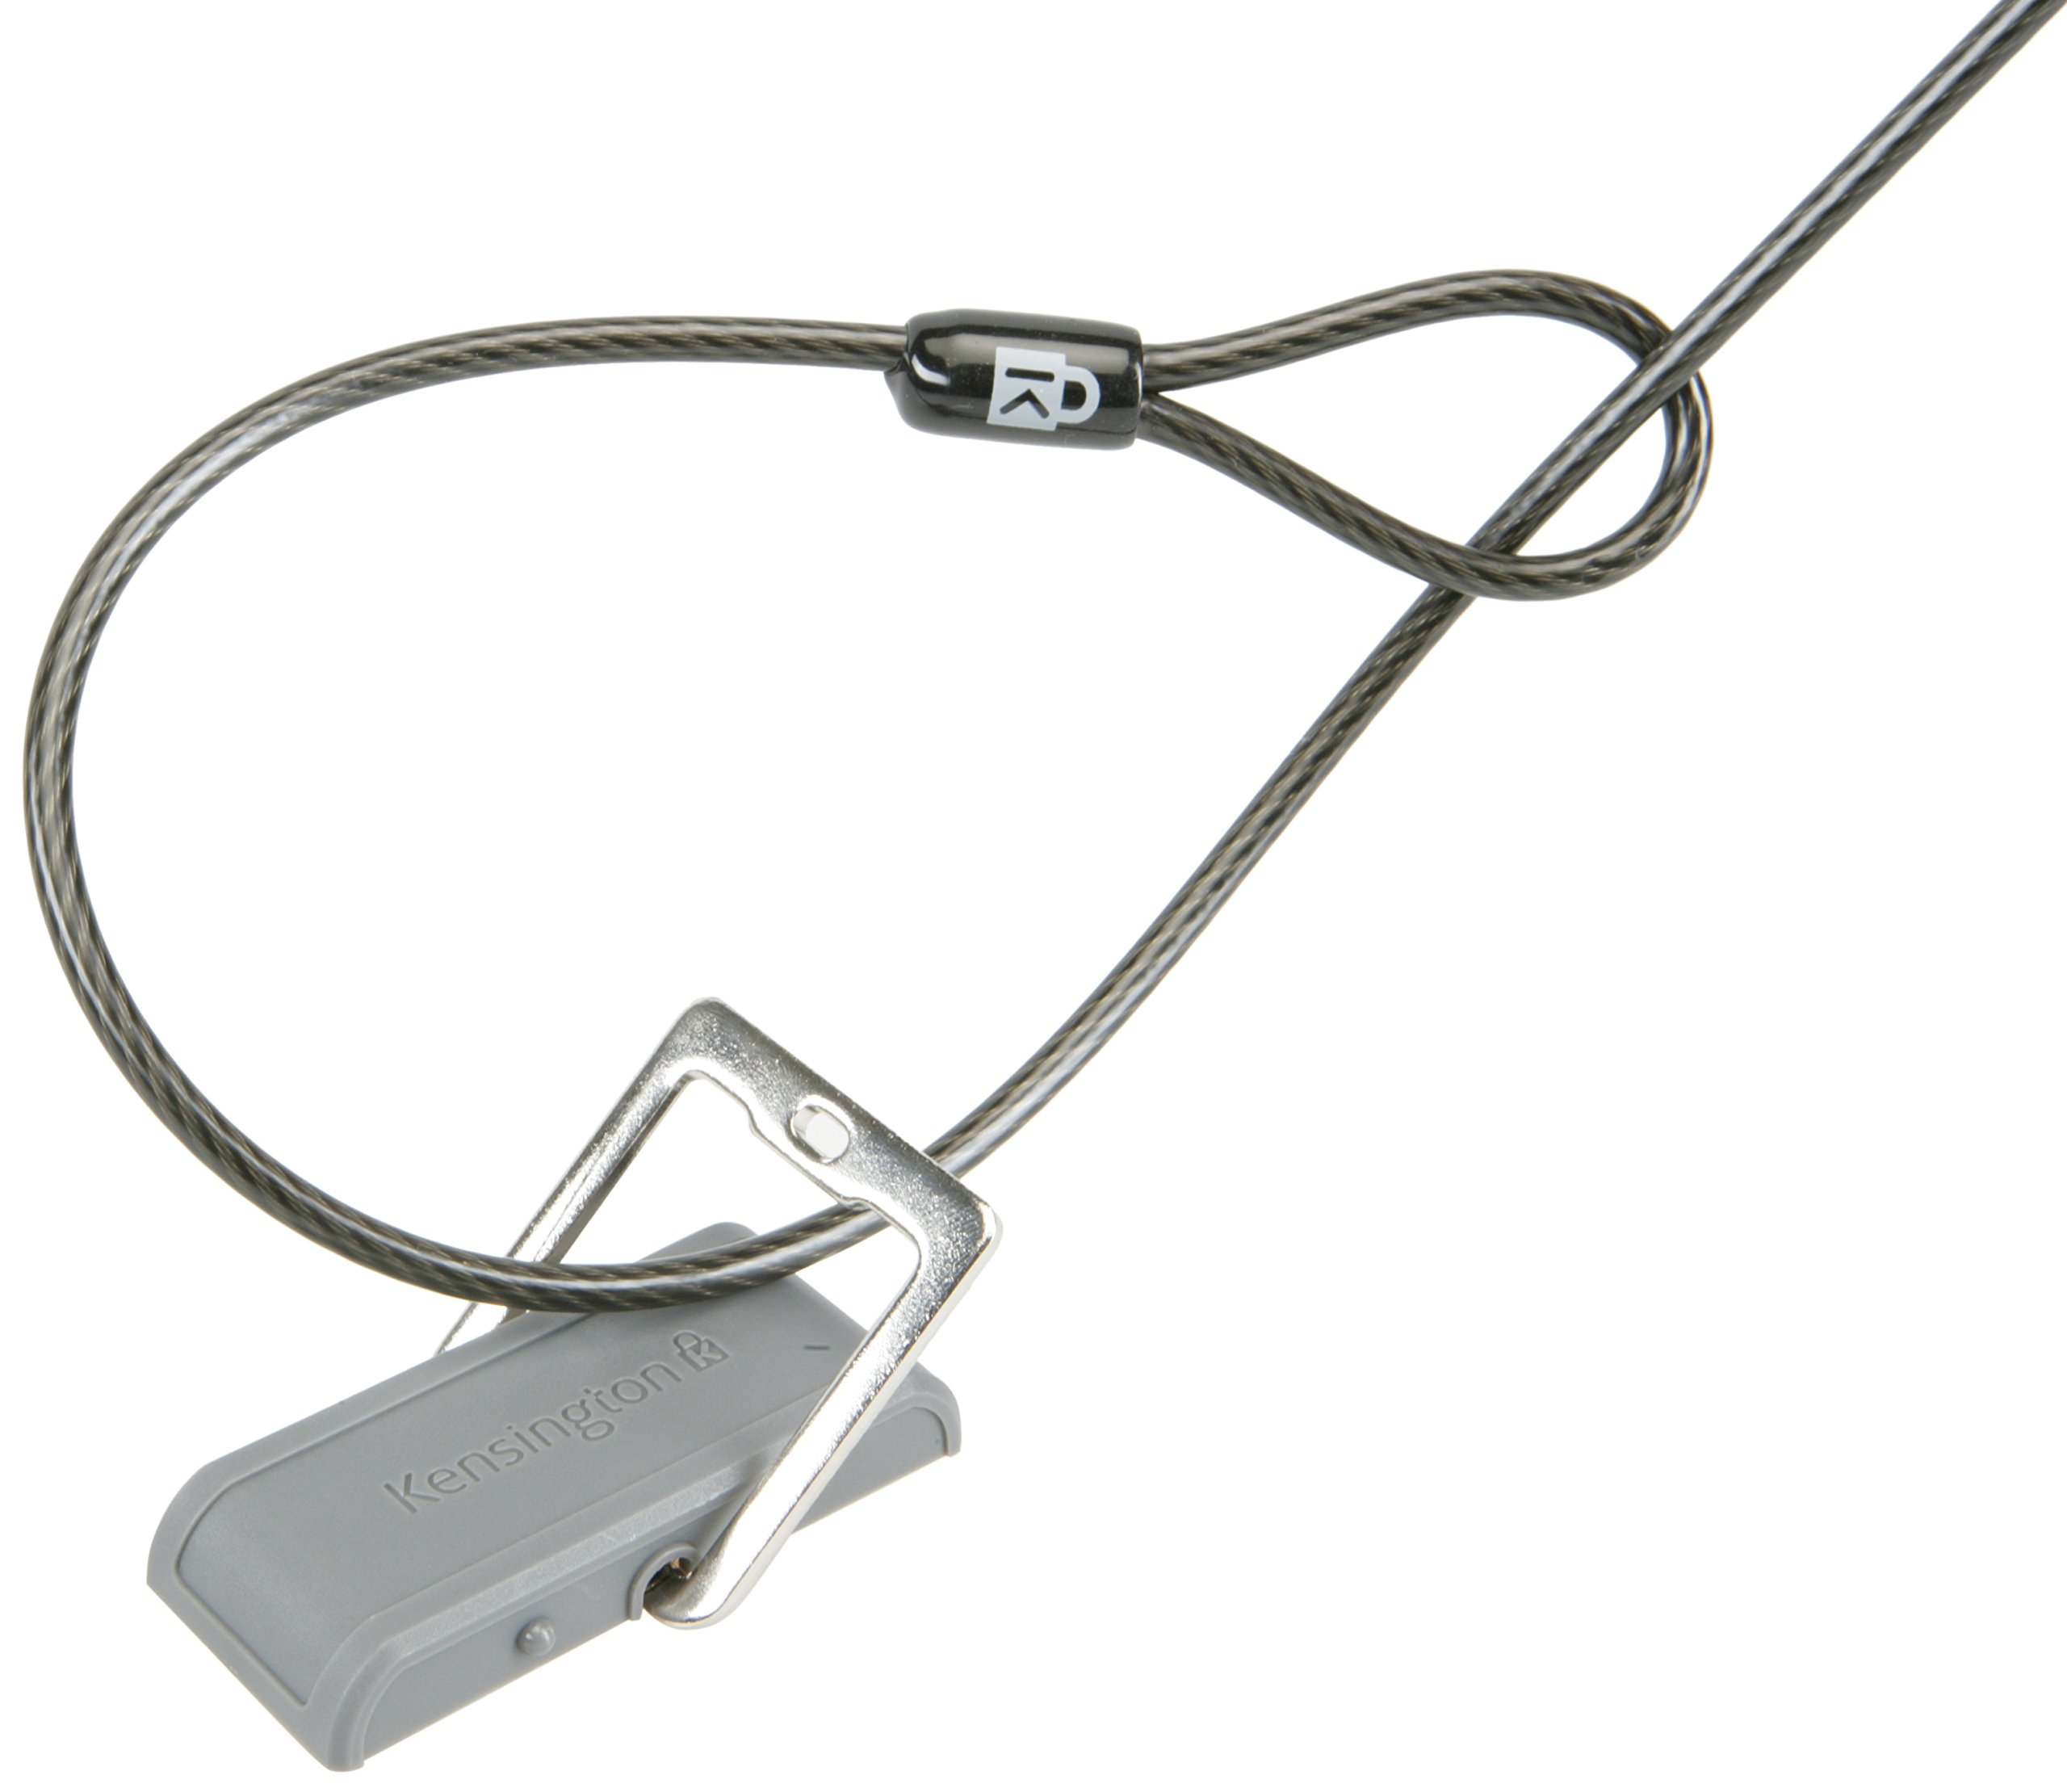 Kensington Desk Mount Anchor Accessory for Cable Locks (K64613WW)